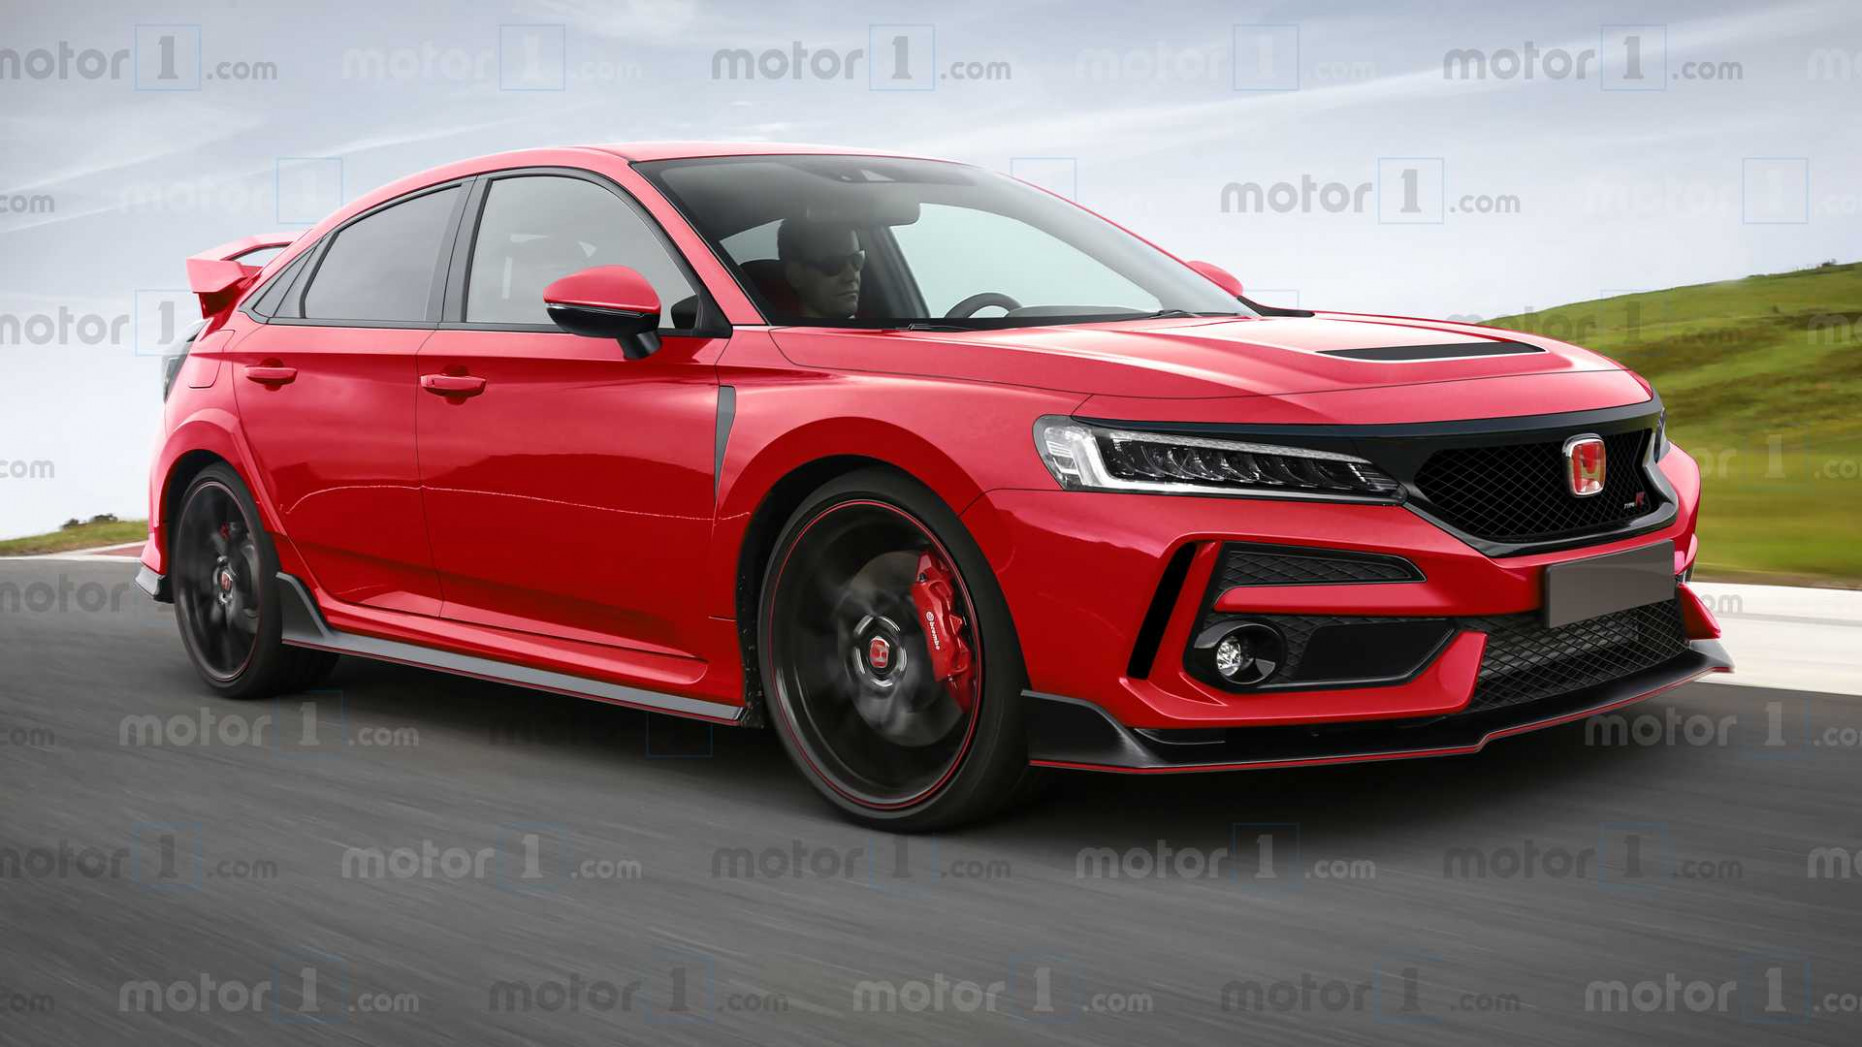 Performance and New Engine 2022 Honda Civic Si